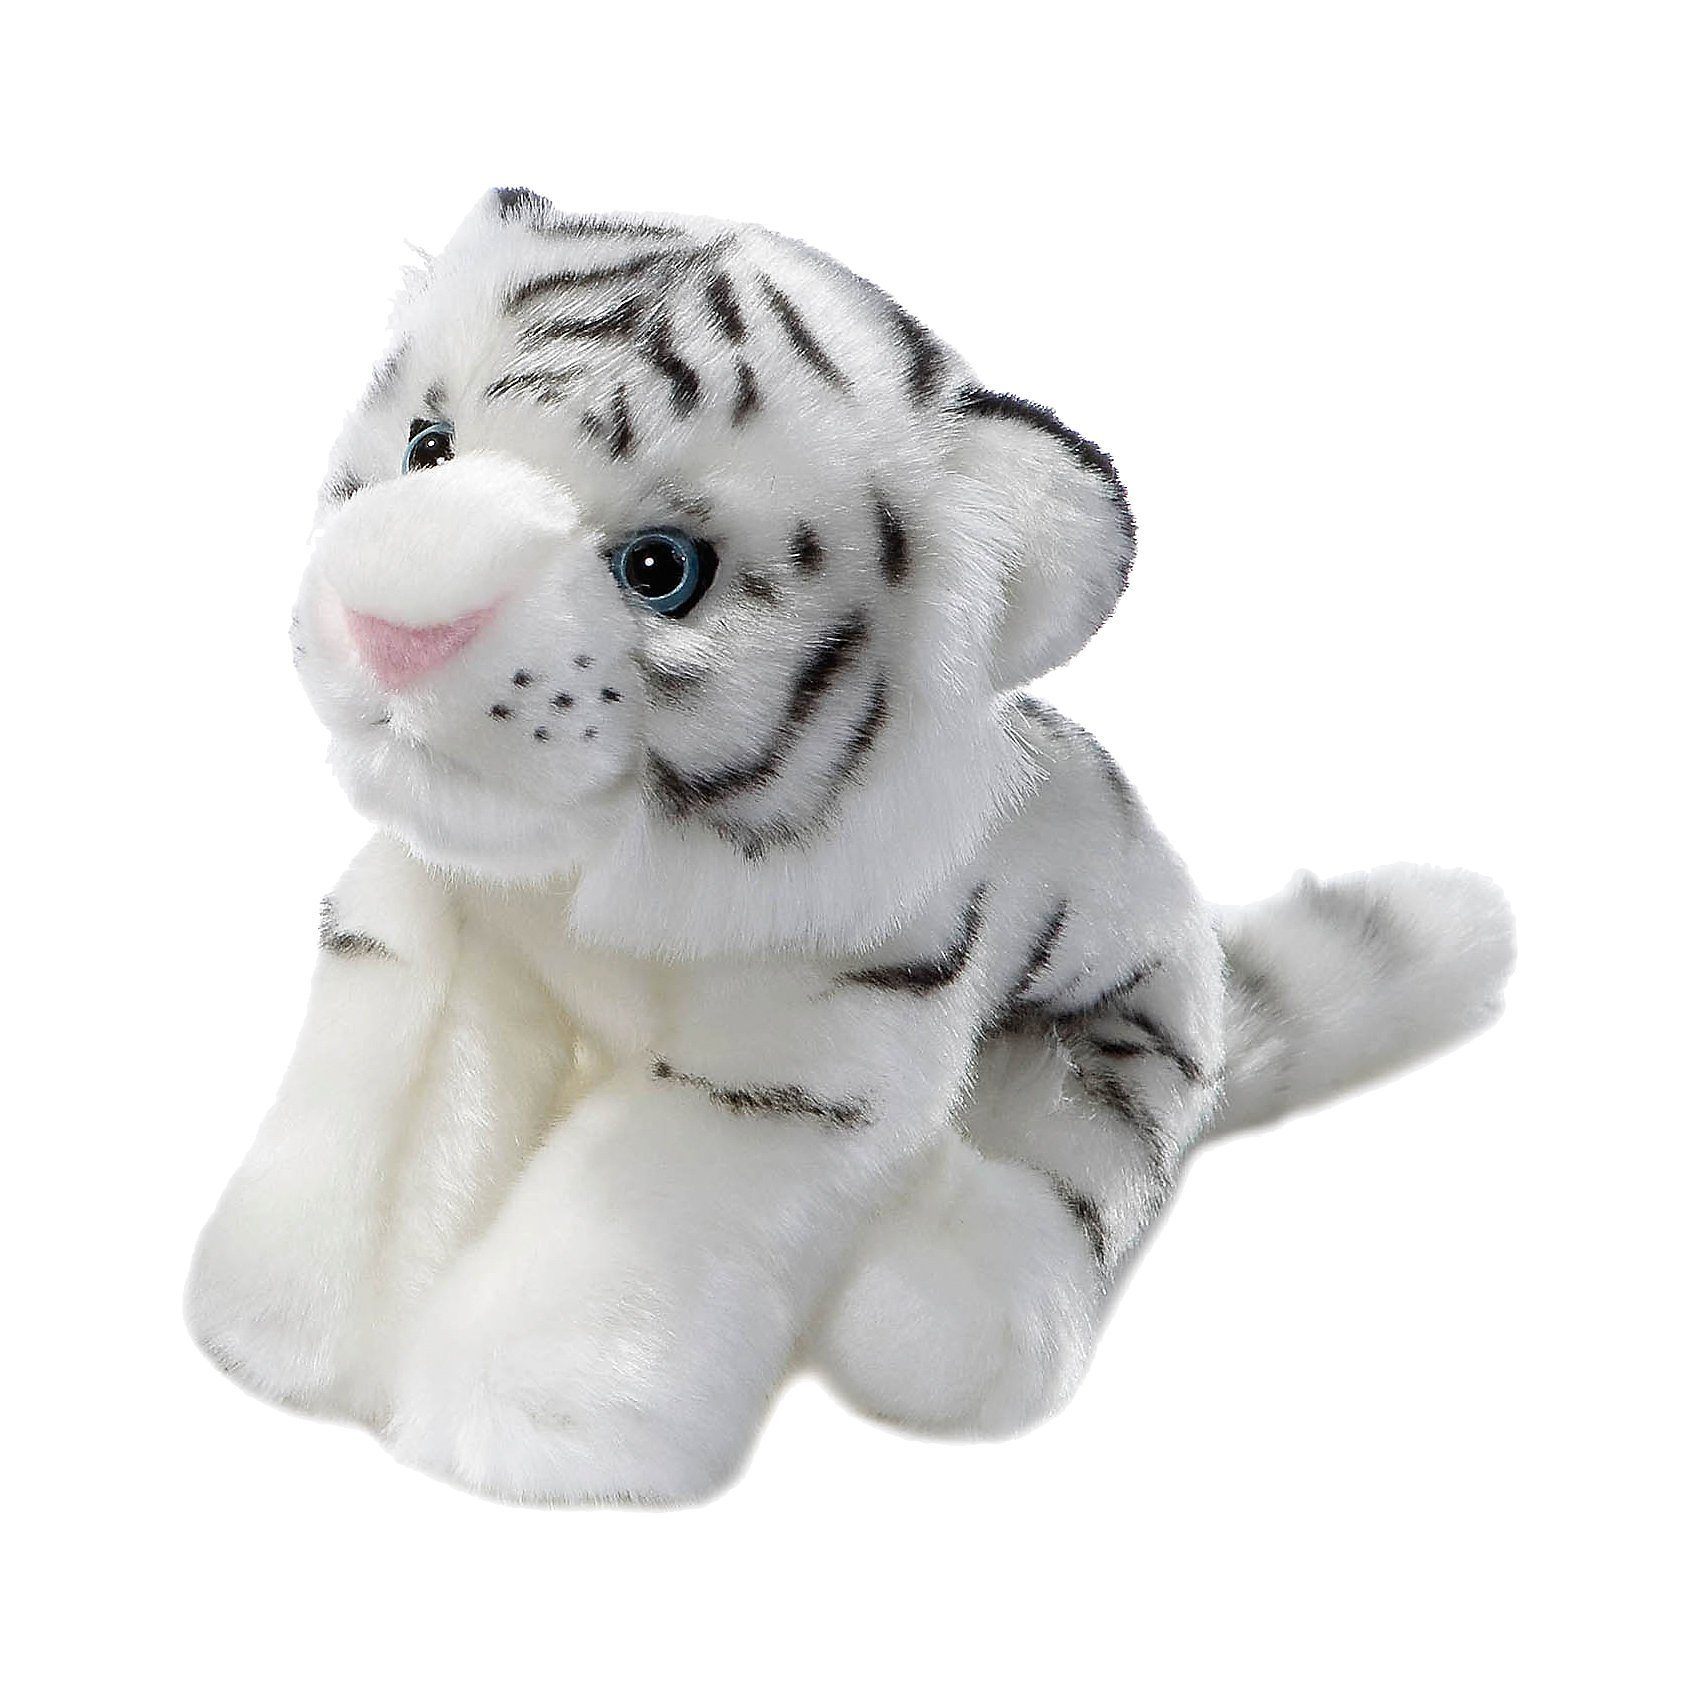 Heunec MI CLASSICO Baby Schneetiger, 20 cm